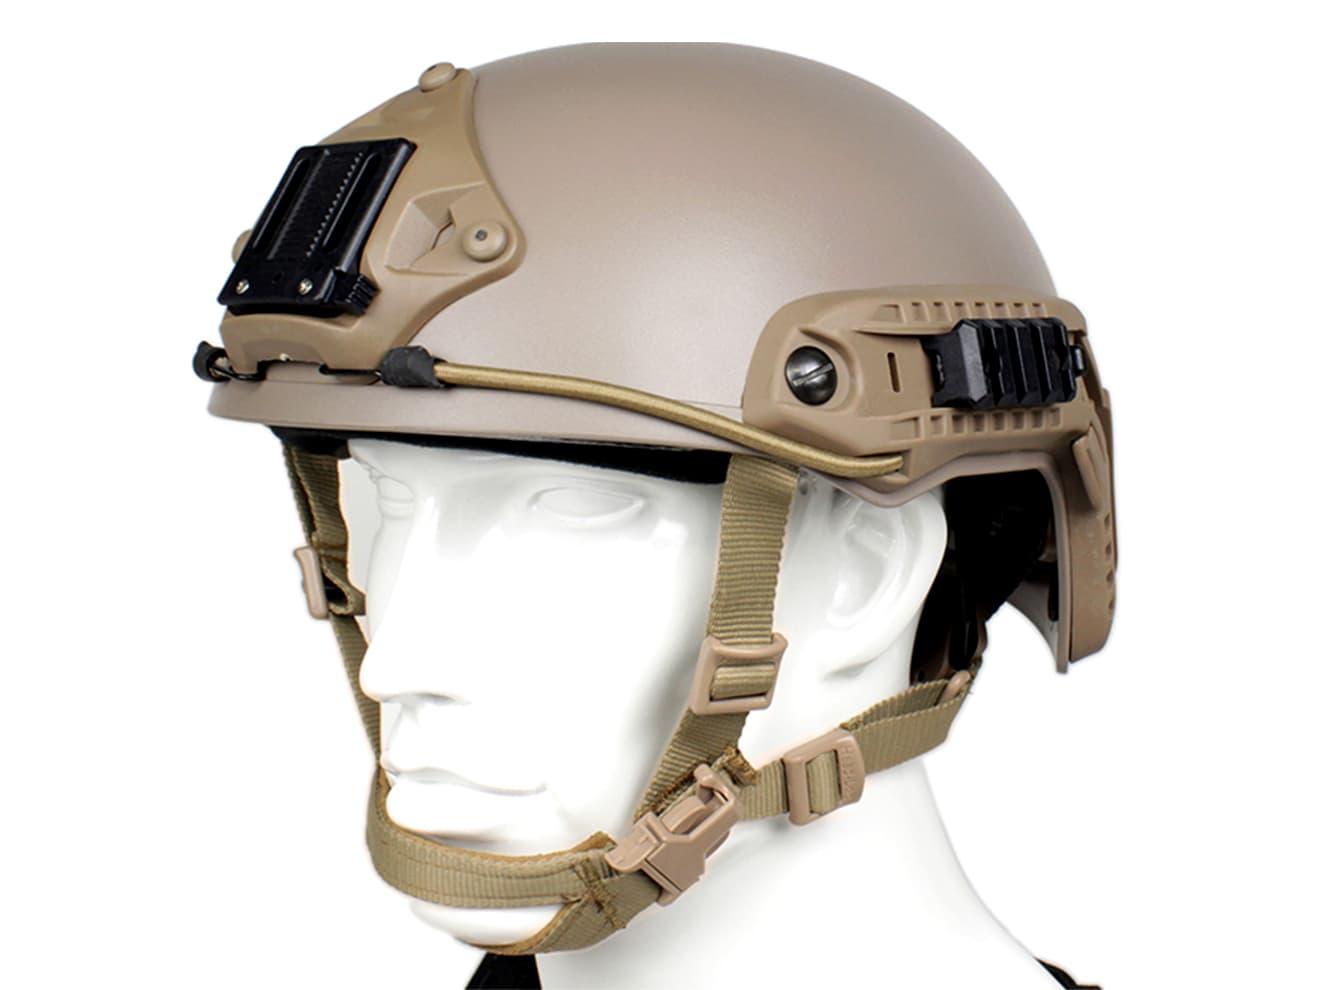 OPS-CORE FAST BALLISTIC タイプ ヘルメット DE M/L◆VSAシュラウド標準装備/米軍/特殊部隊